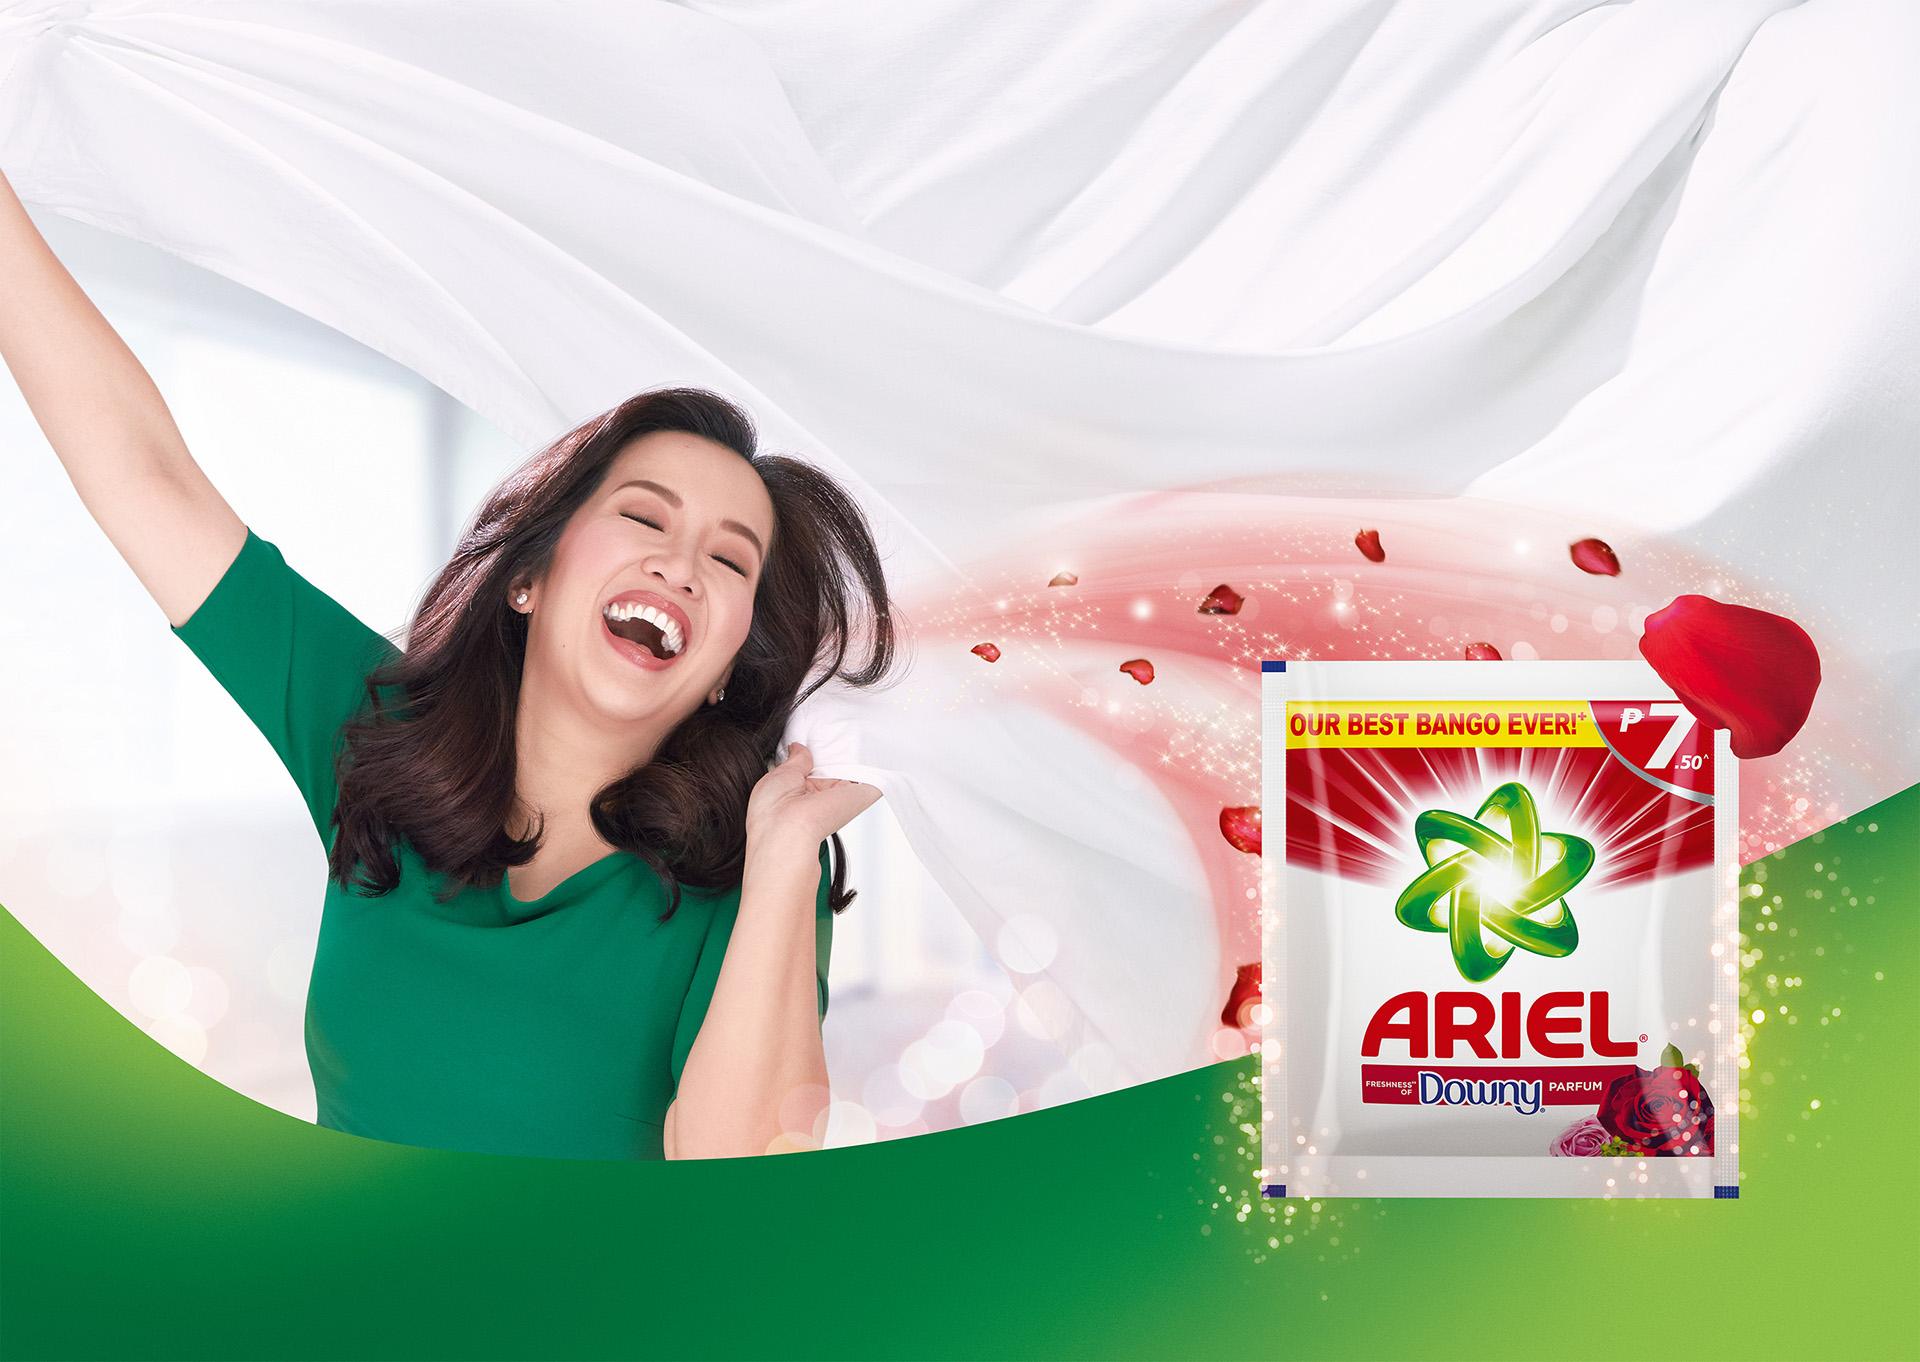 061 Ariel-Kris Surfbeater KV